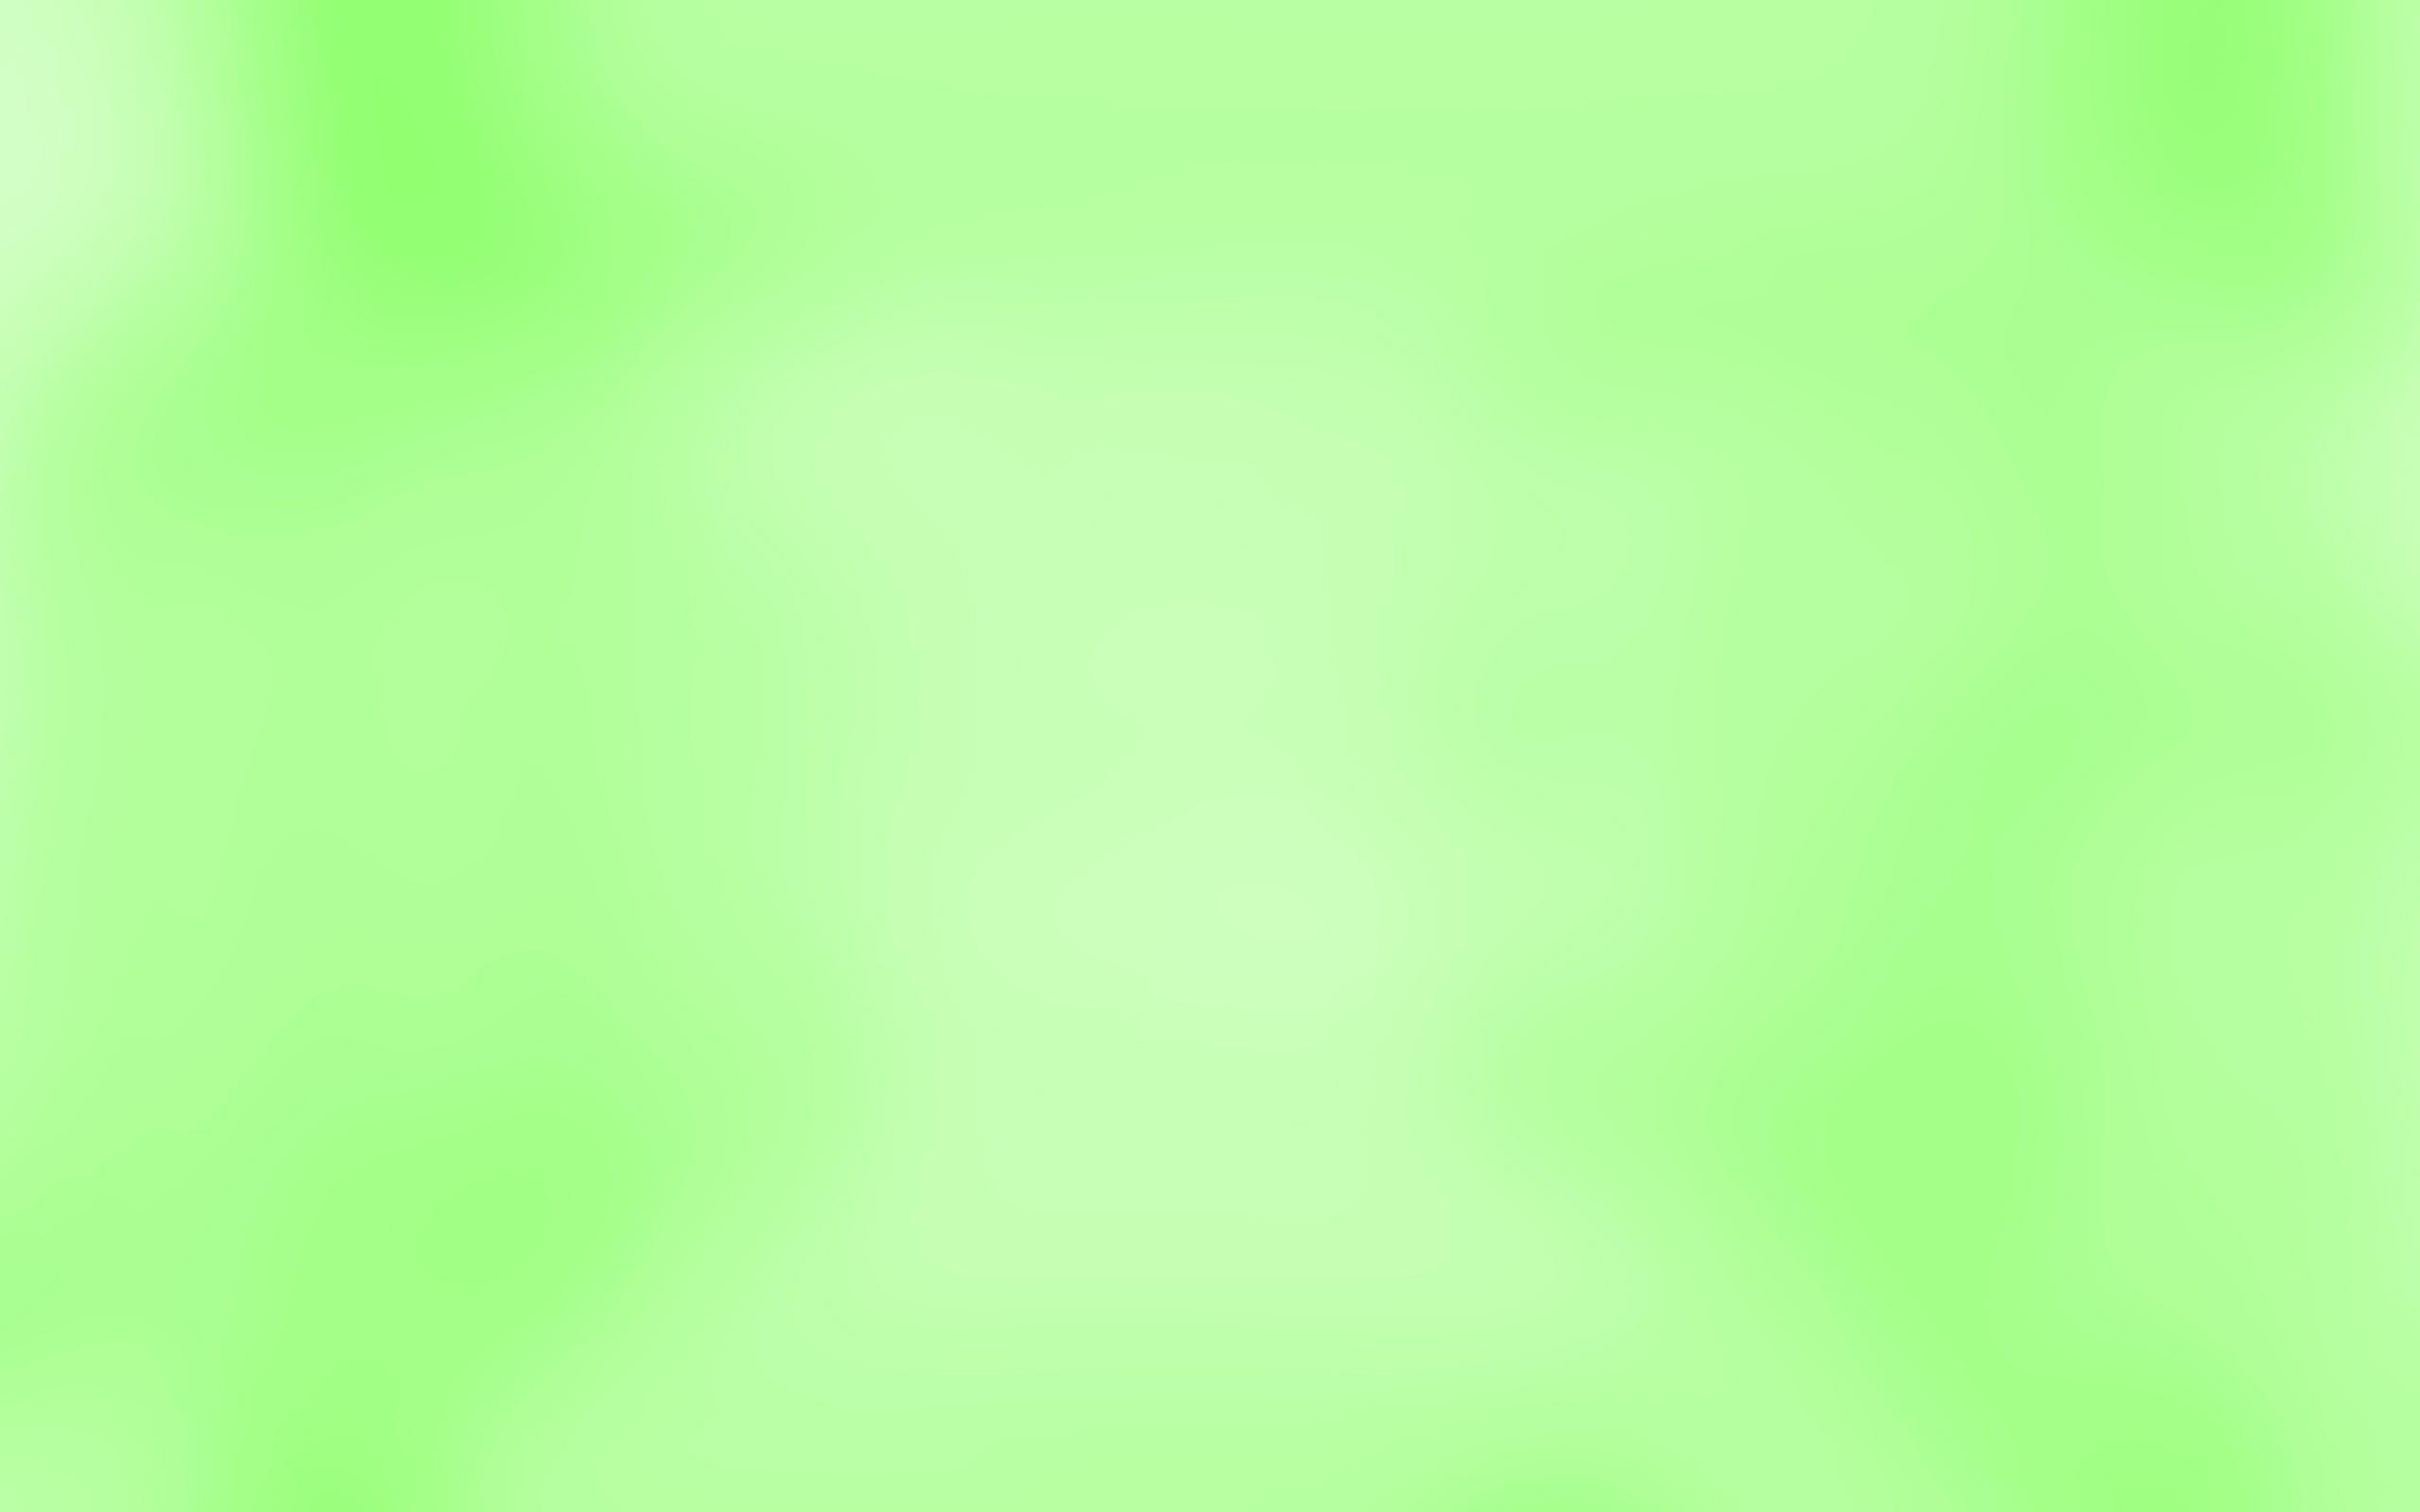 Download Green Light Wallpaper Hd Backgrounds Download